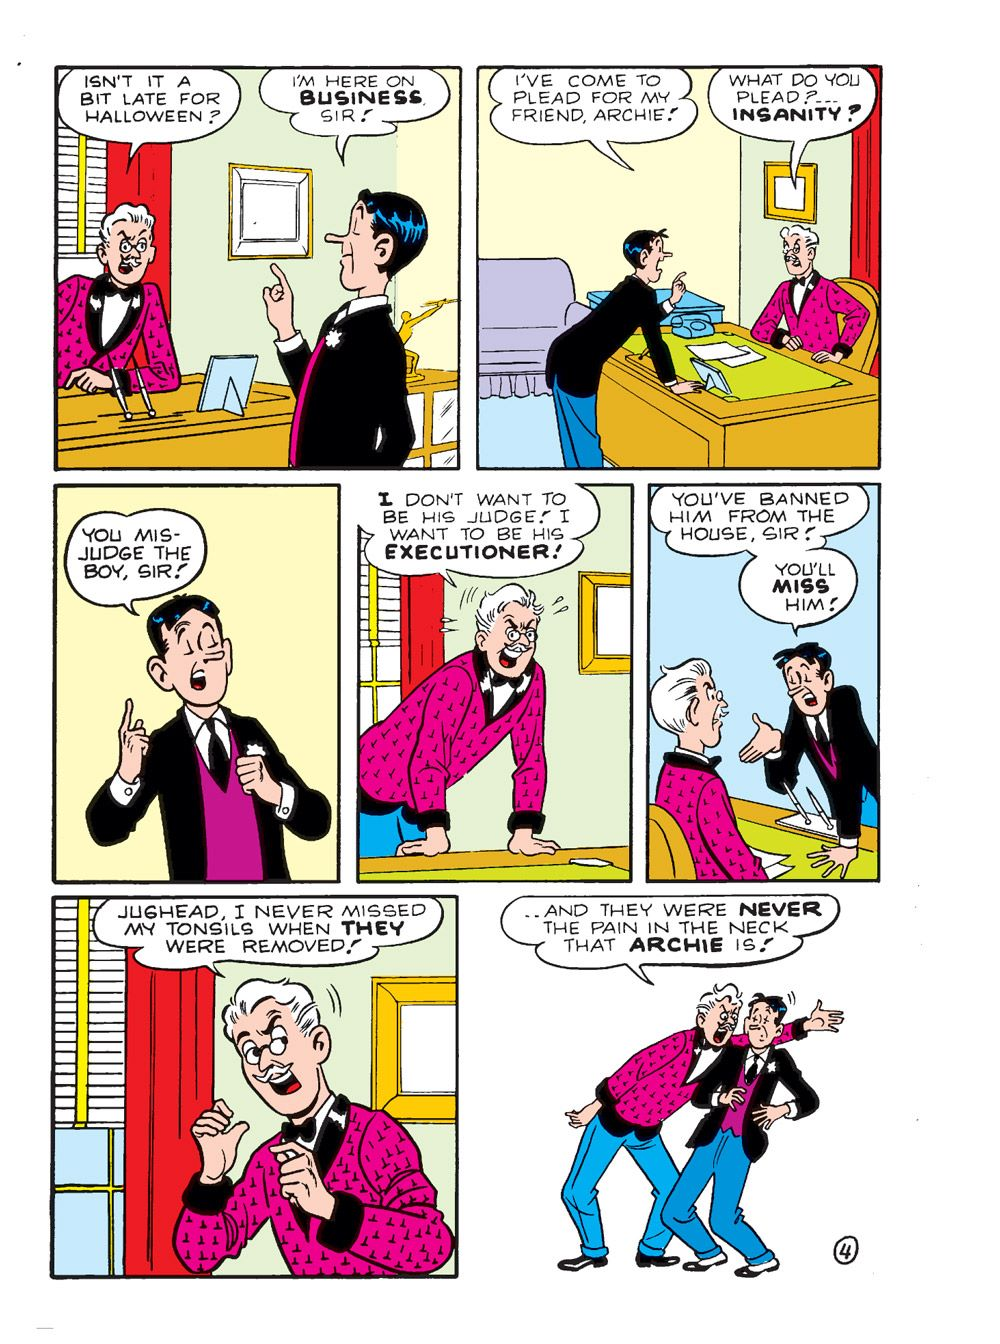 WorldOfArchieJumboComicsDigest_109-139 ComicList Previews: WORLD OF ARCHIE JUMBO COMICS DIGEST #109